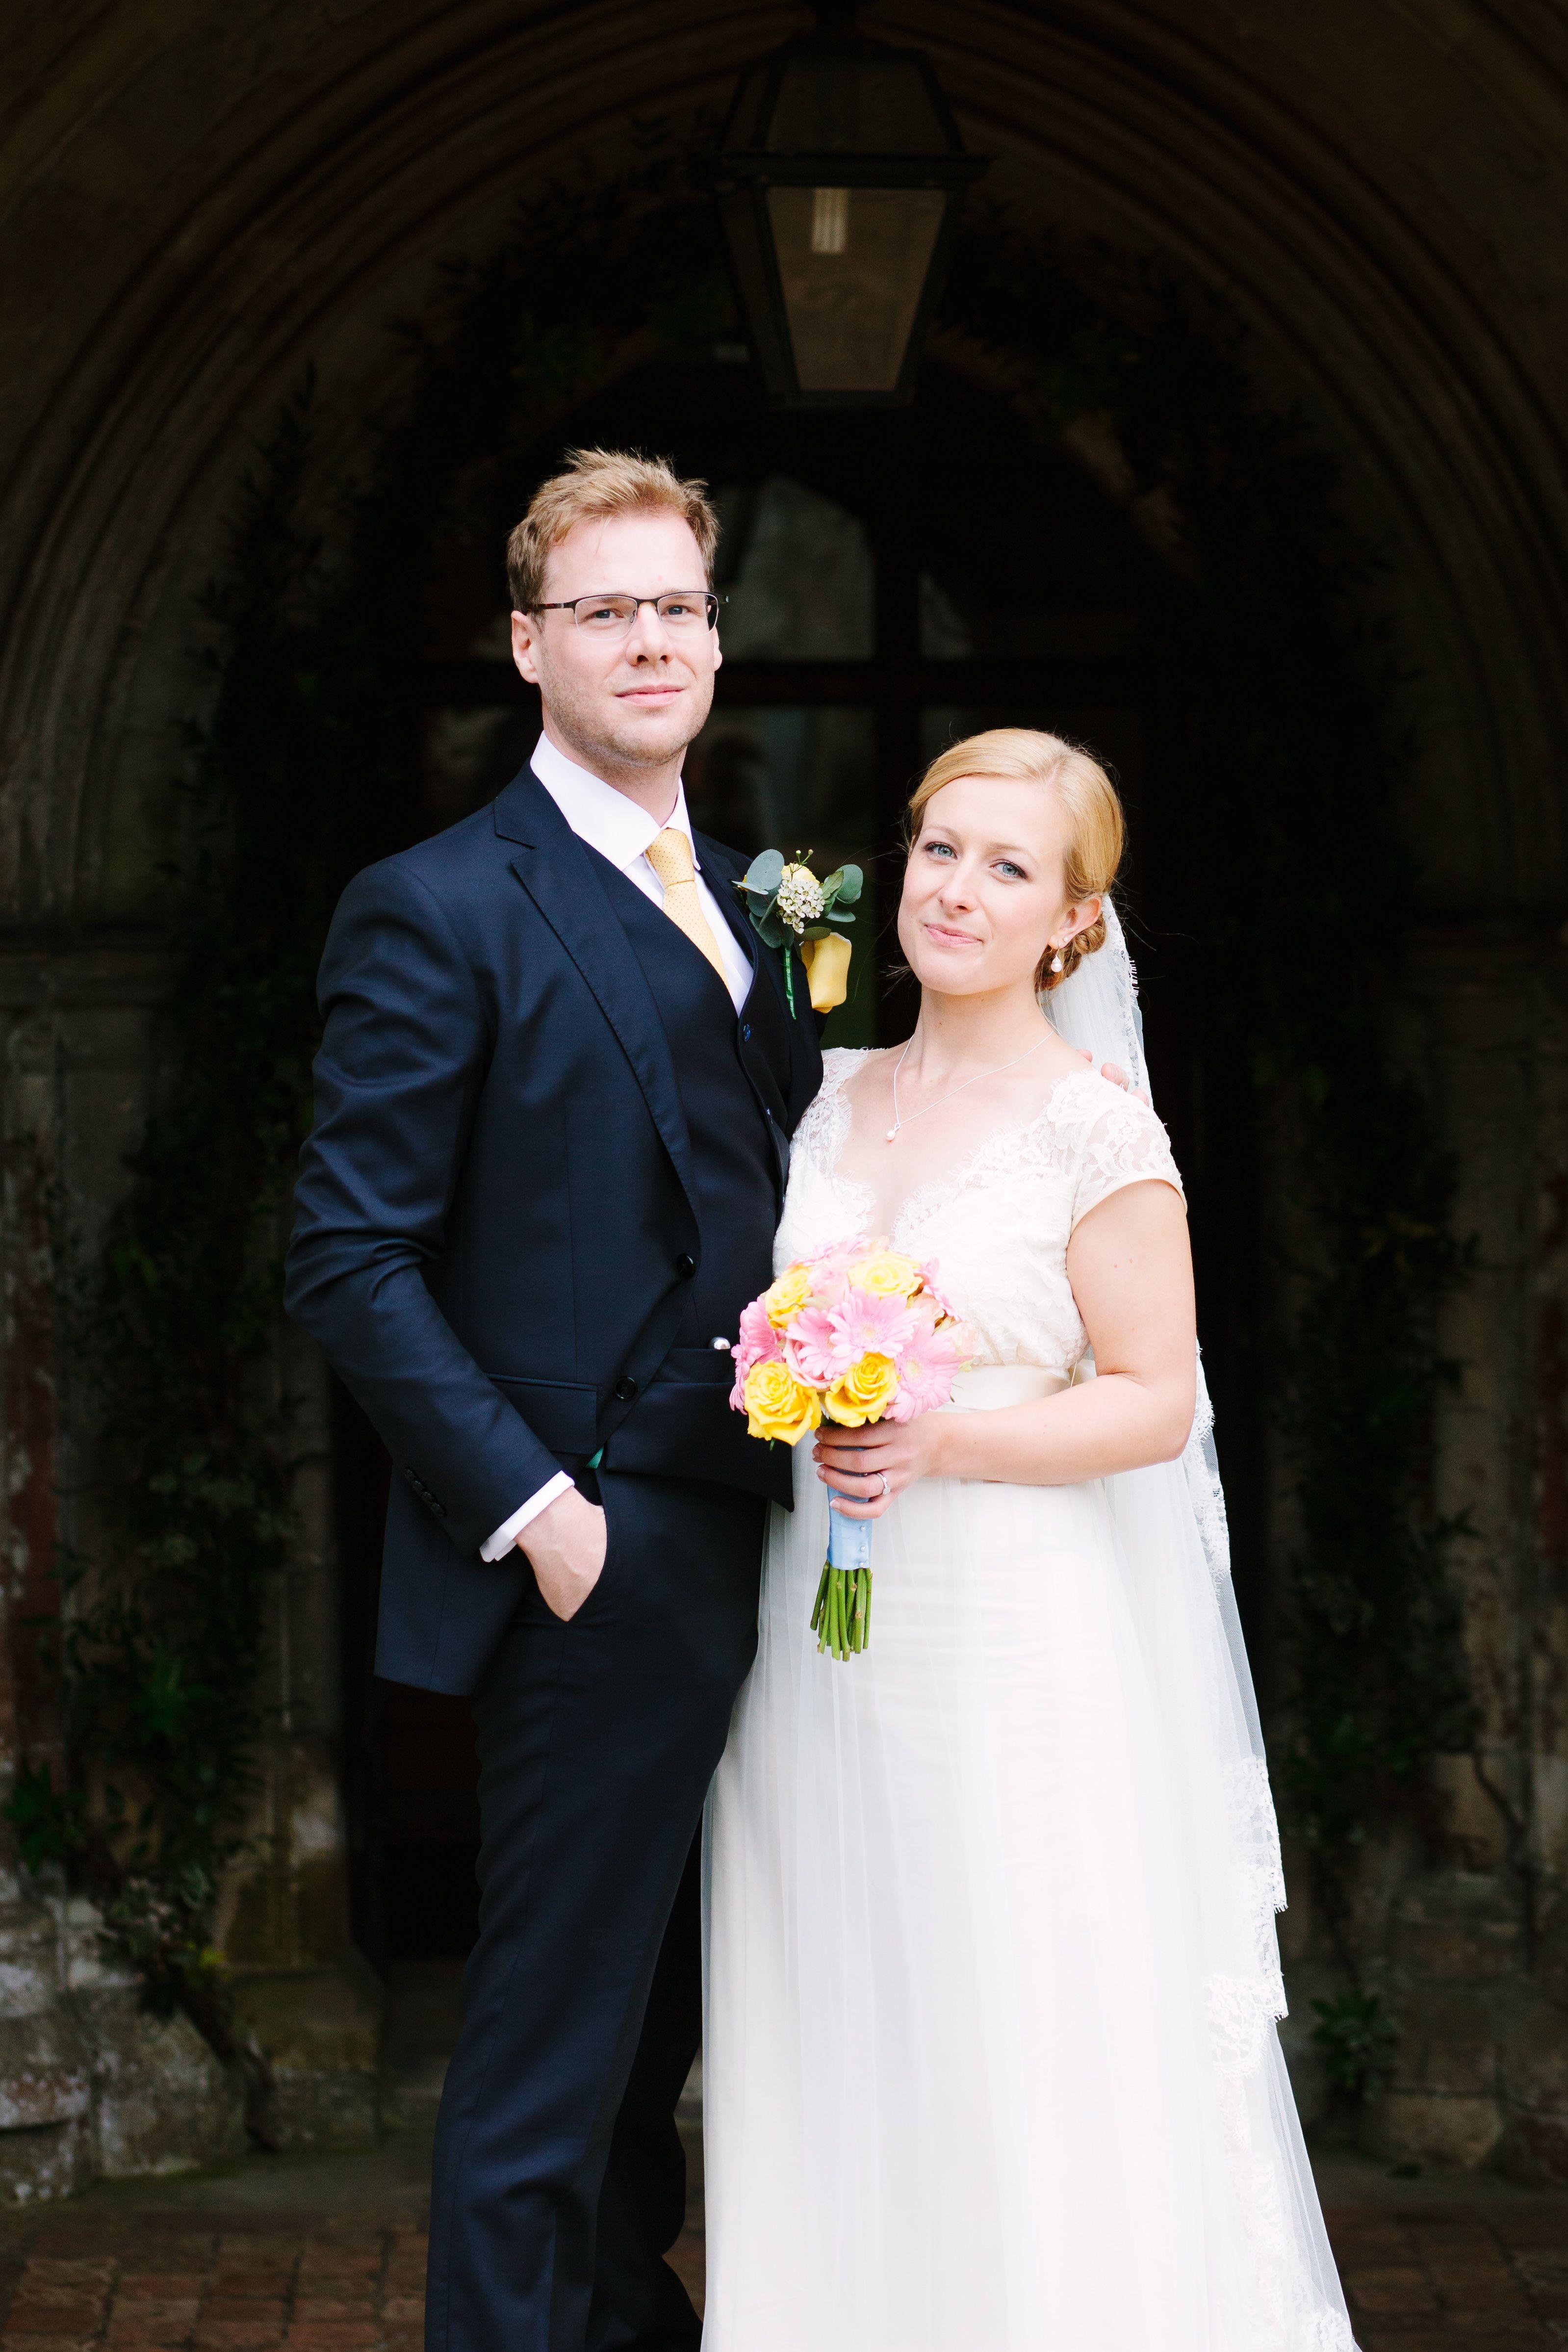 Pin By Arabella Hewitt Make Up Artist On Bridal Portfolio Wedding Hairstyles Wedding Hair And Makeup Bride